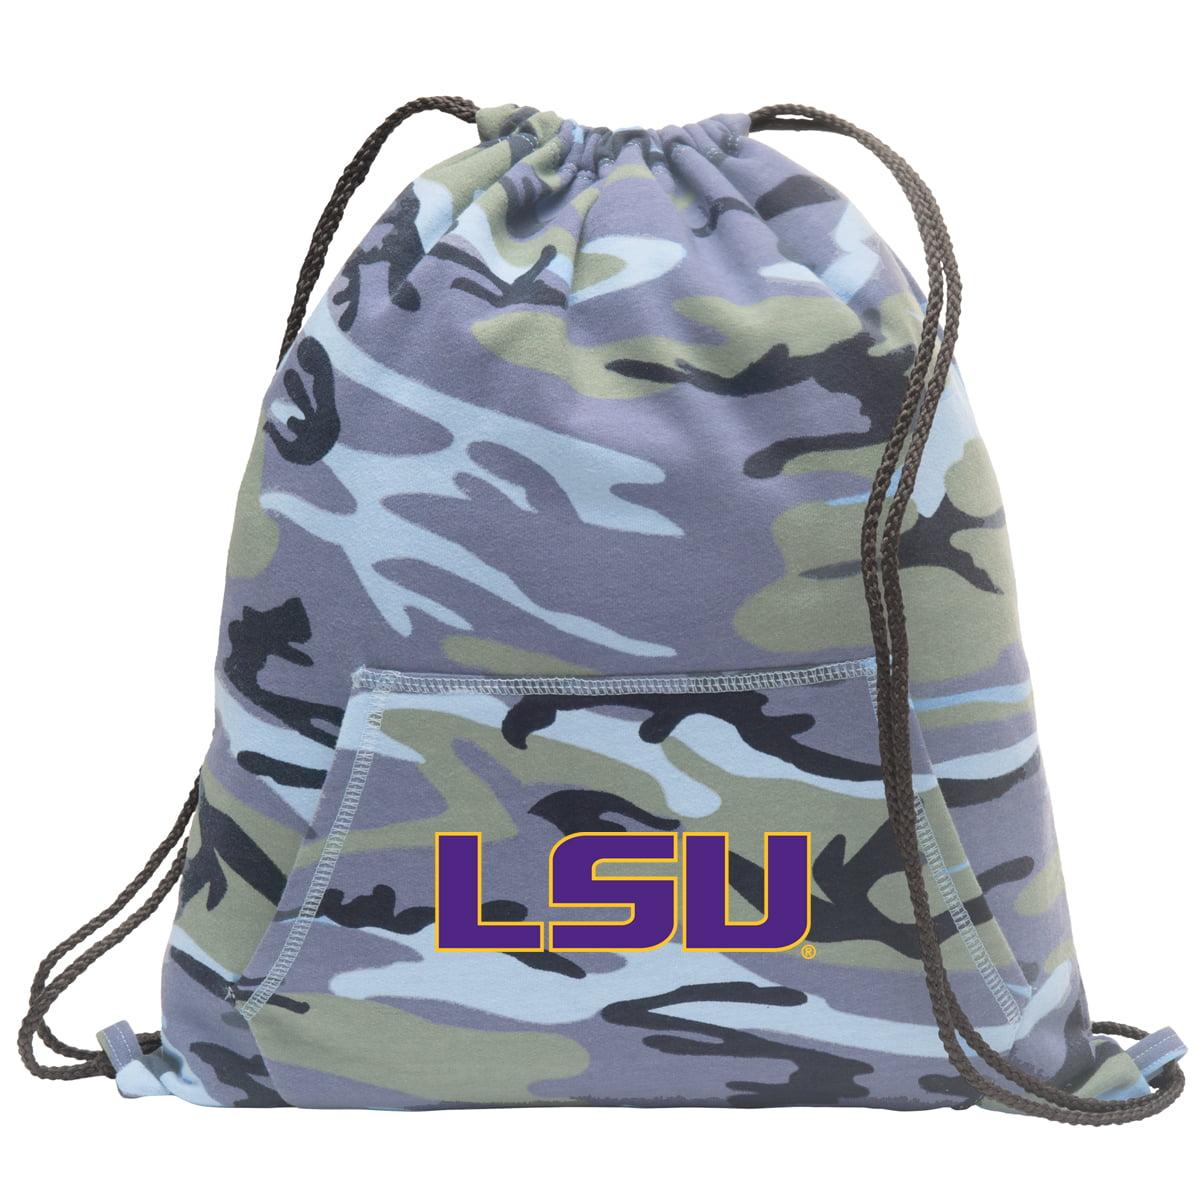 LSU Drawstring Bag Blue Camo Official LSU Tigers Cinch Backpack for Boys Girls Men Women